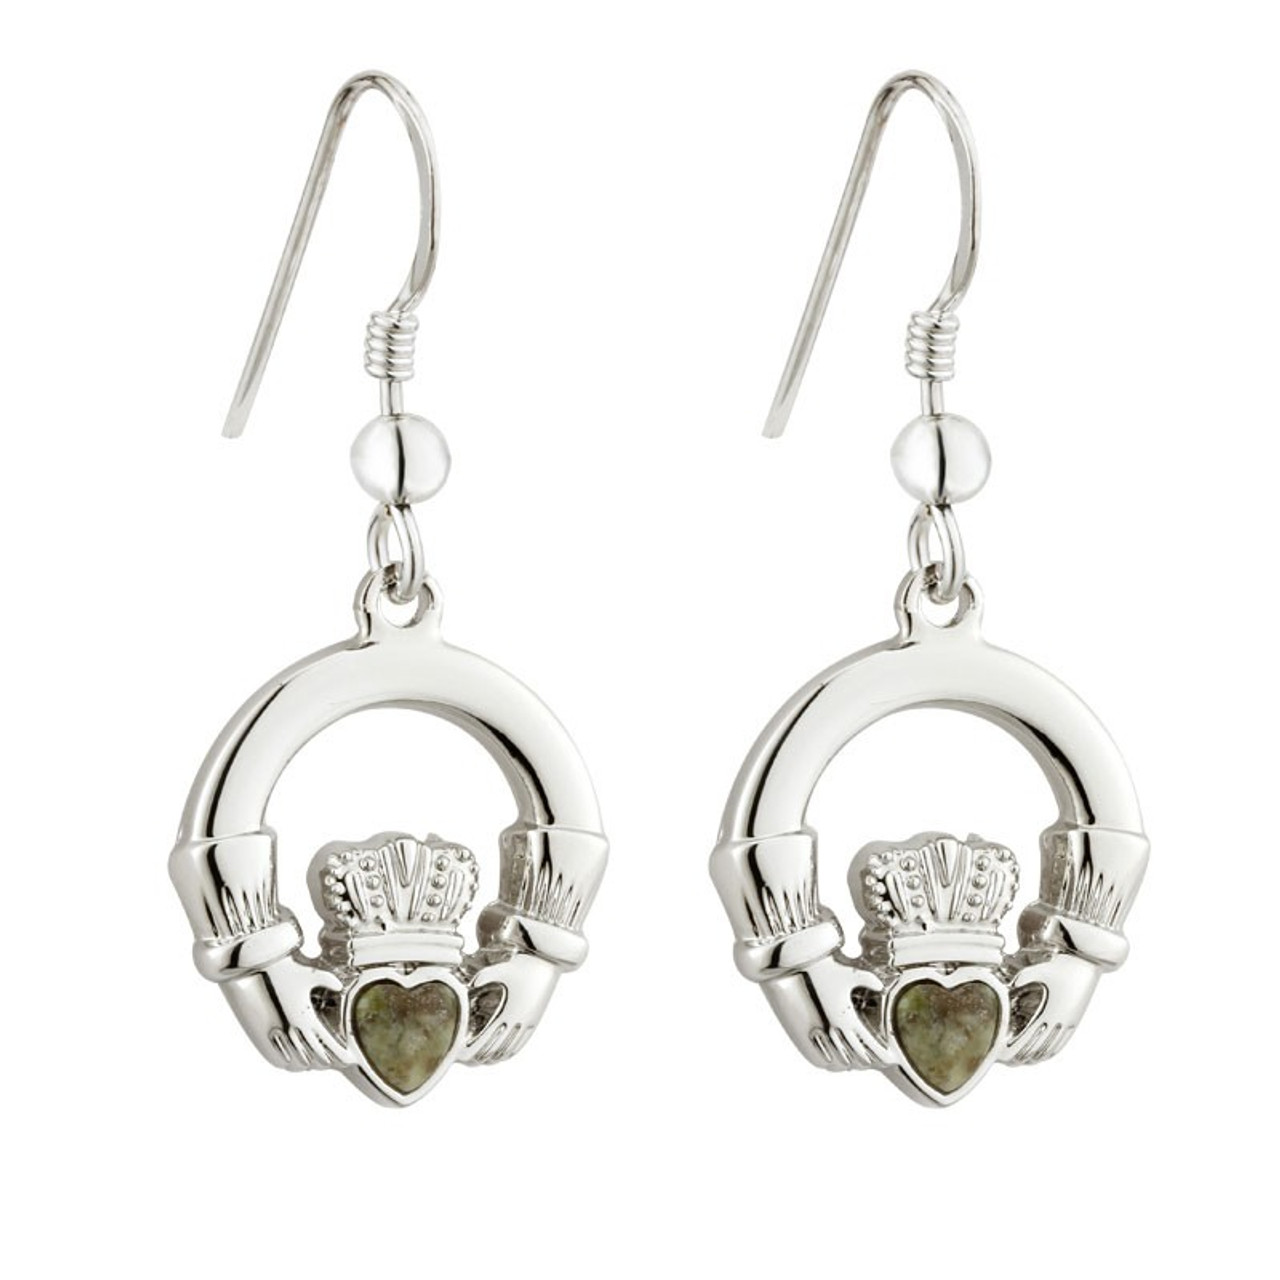 Rhodium Claddagh Earrings with Connemara Marble